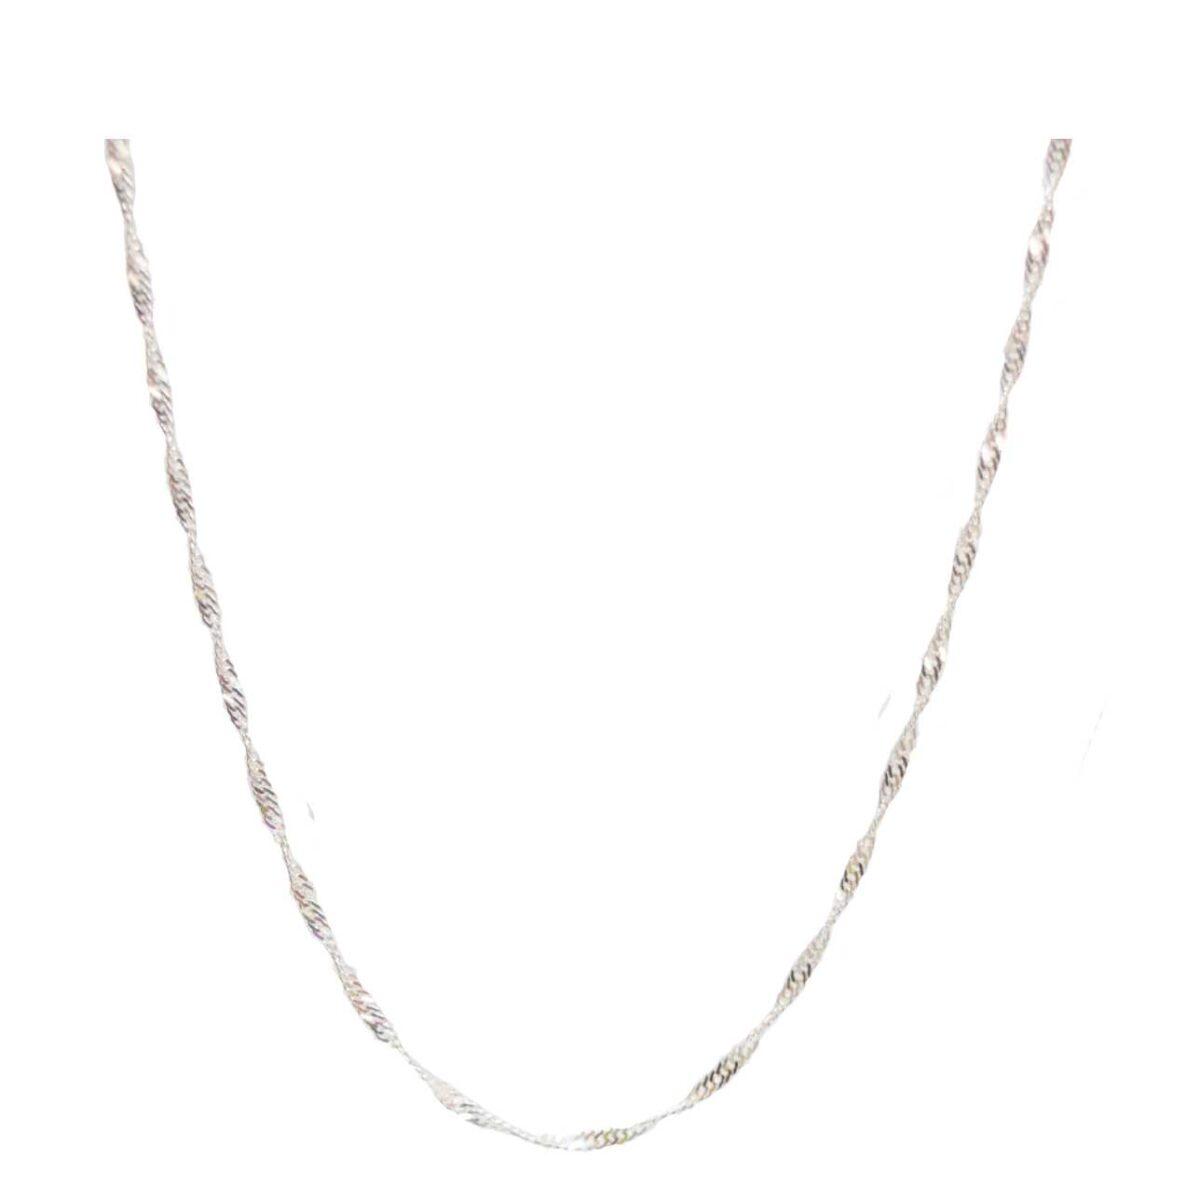 Twist me chain II silver